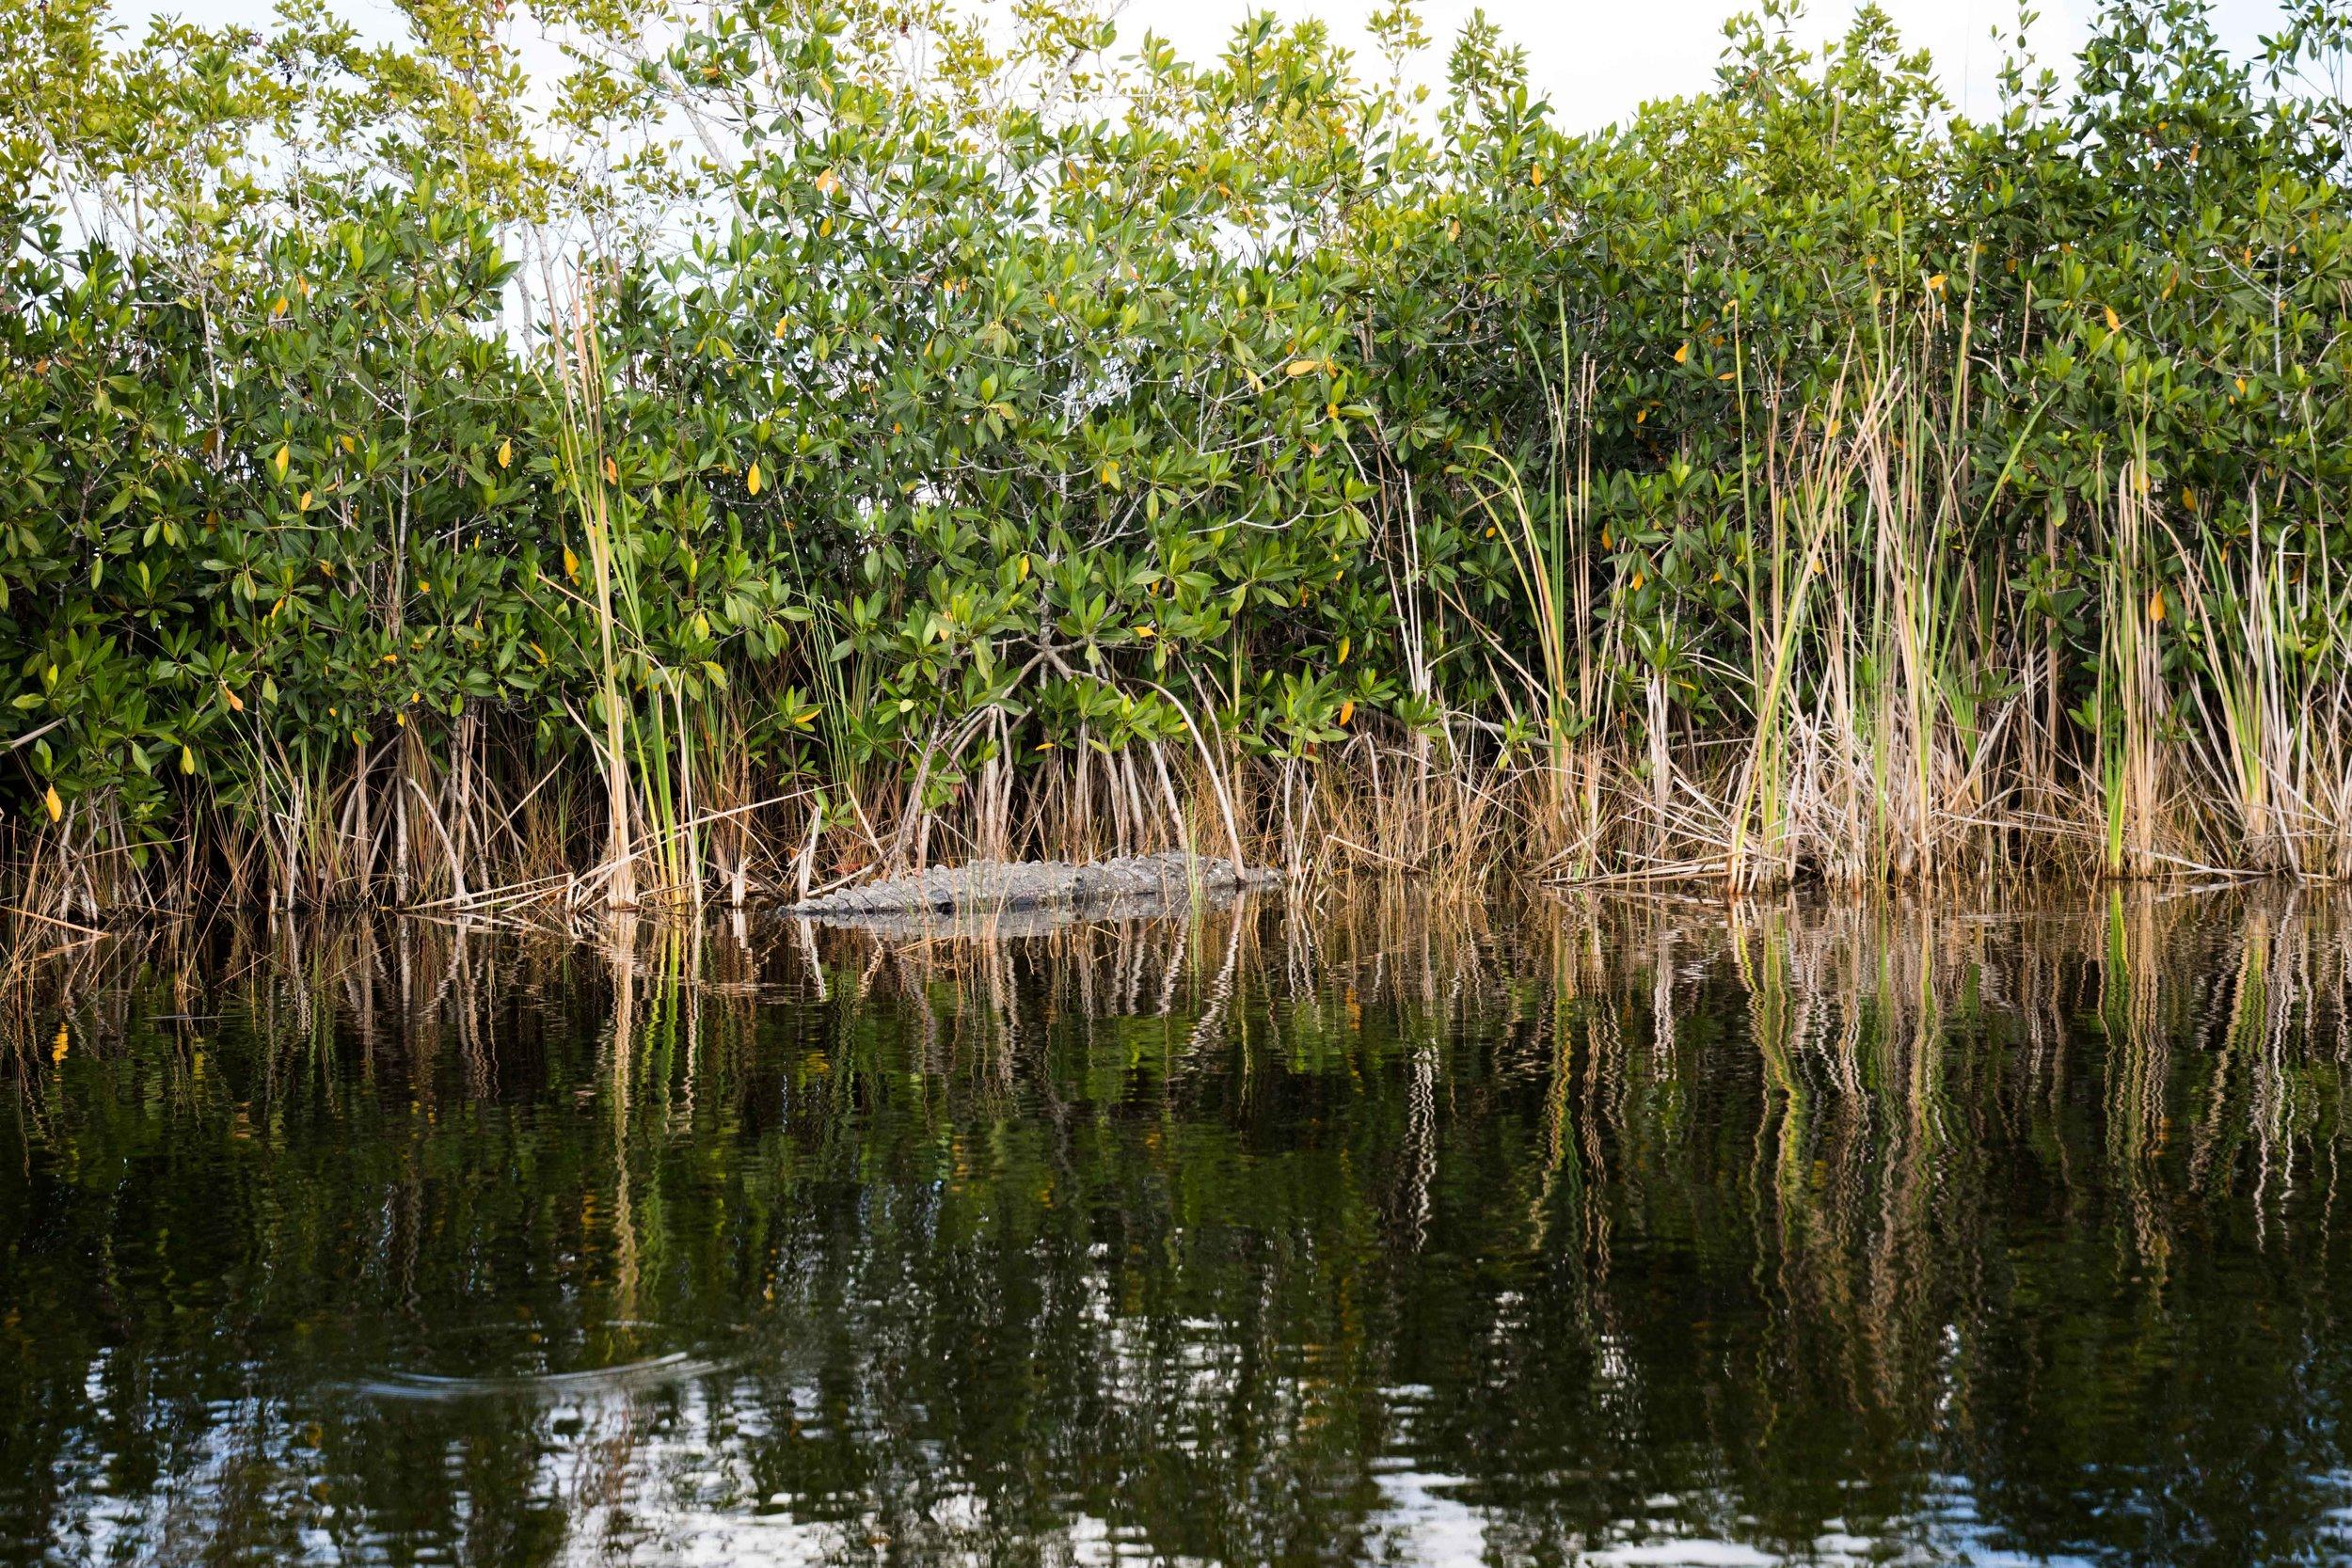 2019_Everglades-93.jpg